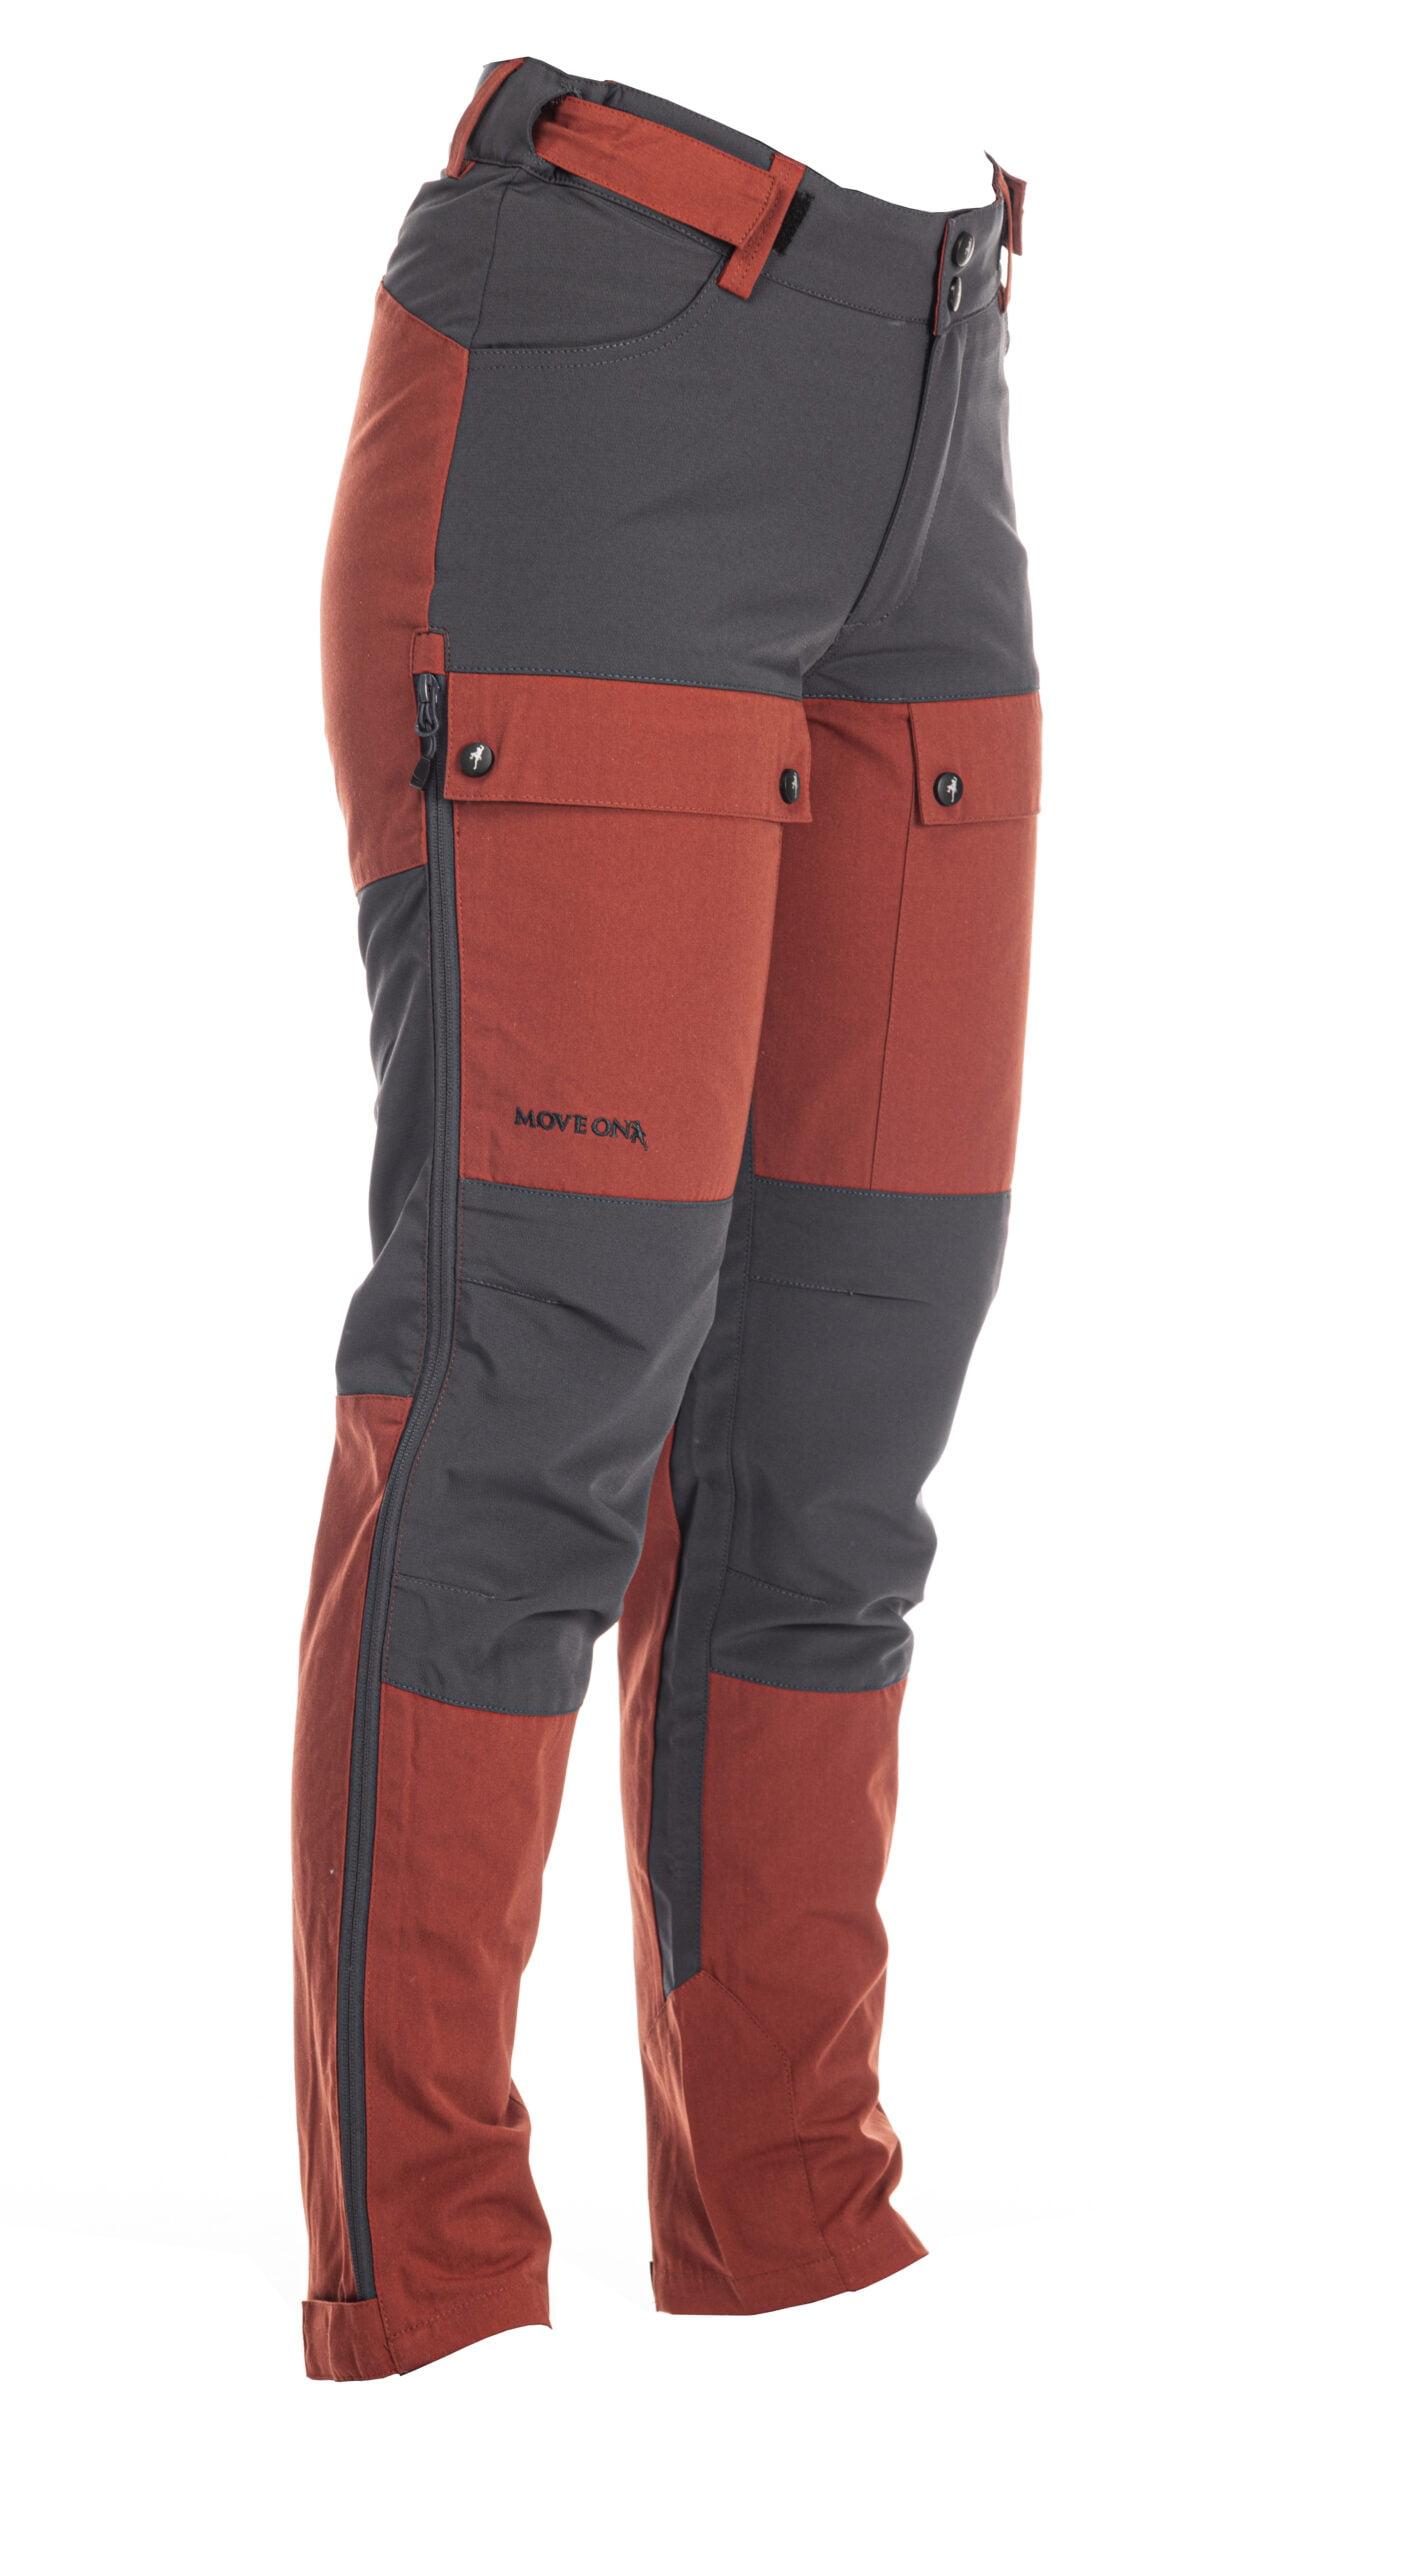 Move On Stryn Bukse Brent Orange